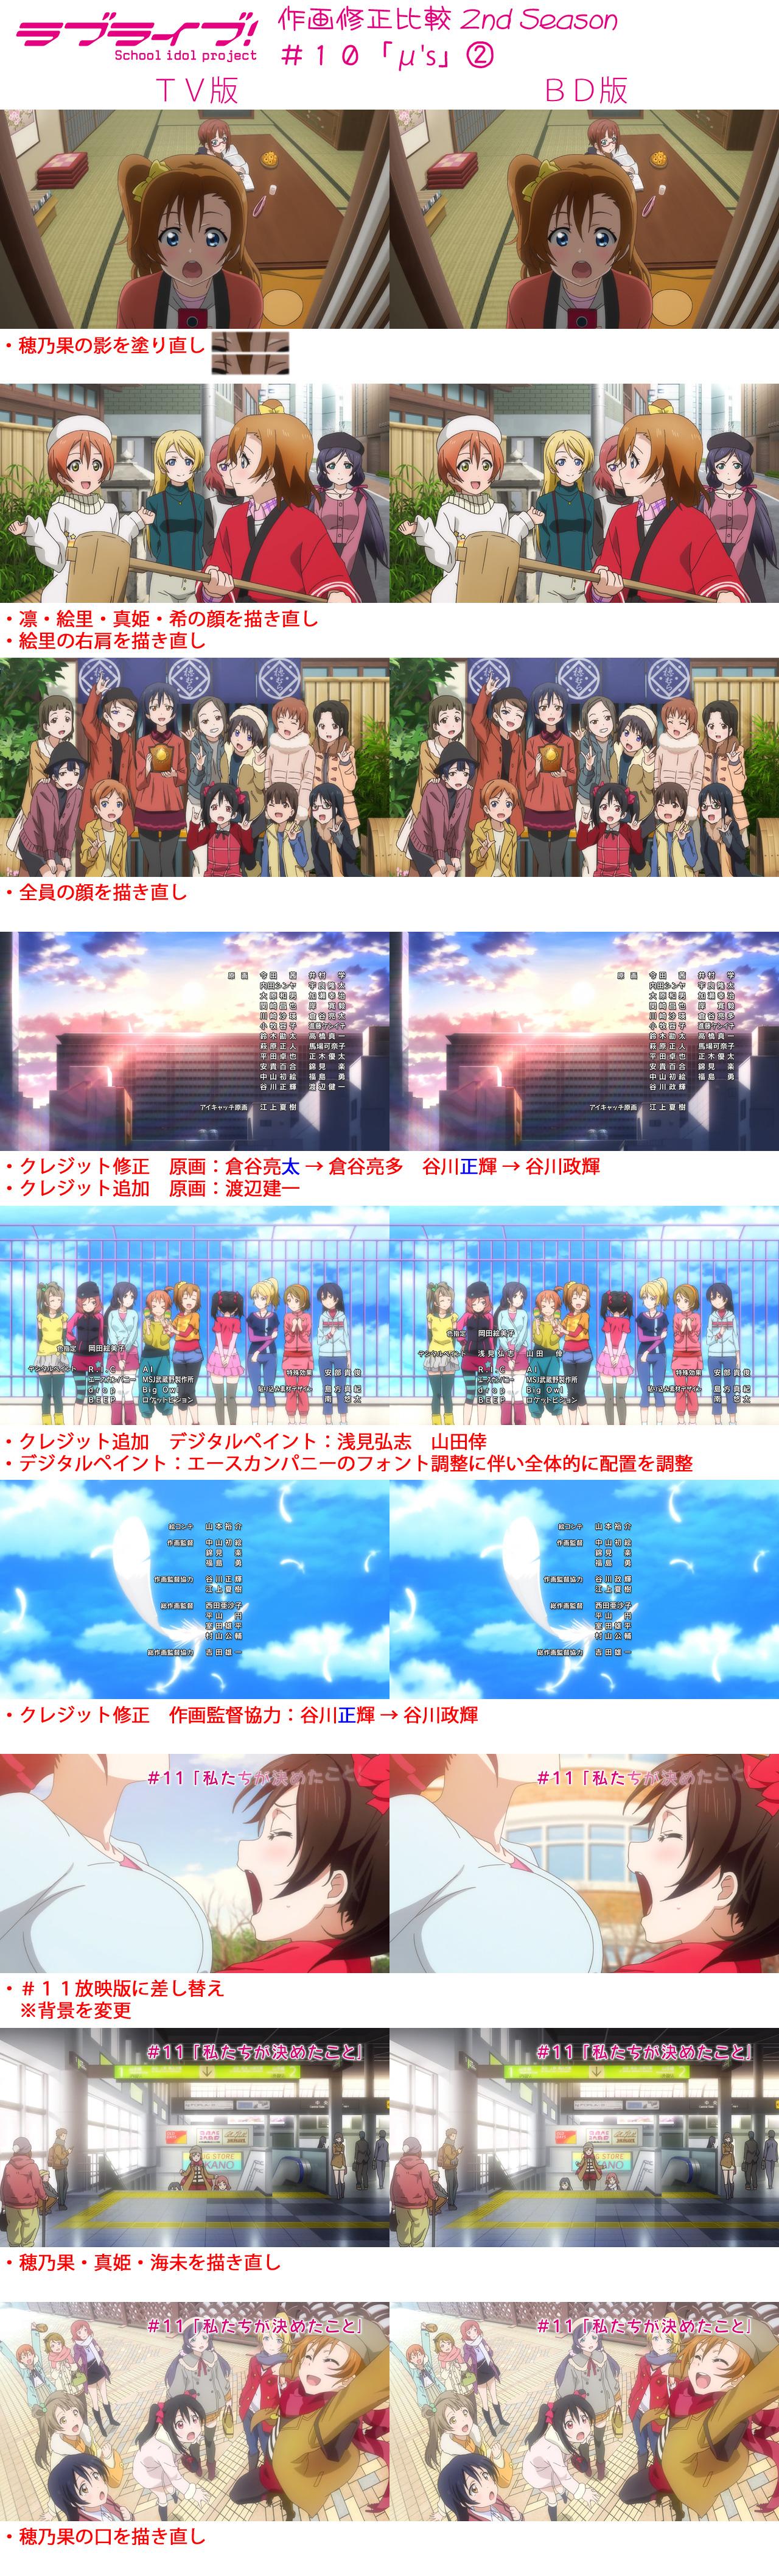 Love-Live!-School-Idol-Project_Haruhichan.com-Season-2-TV-Blu-Ray-Comparison-Episode-10-Part-2